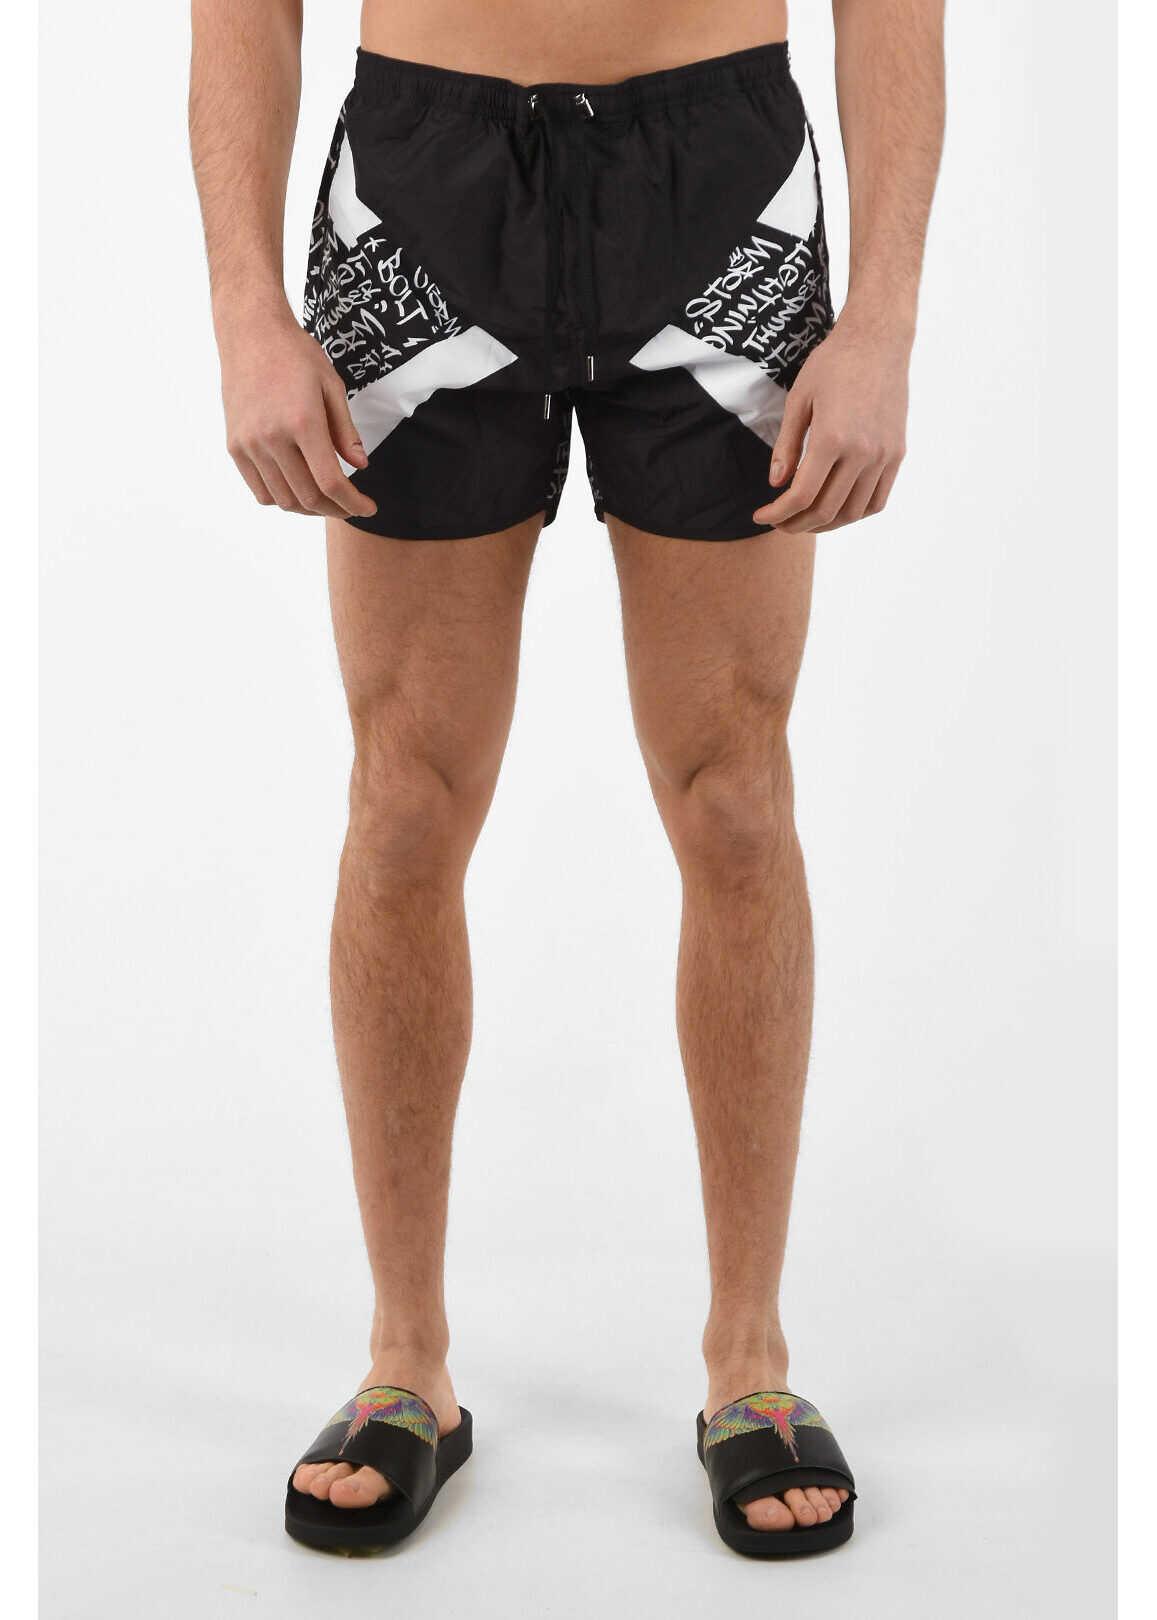 Neil Barrett Printed MODERNIST GRAFFITI Swim Shorts BLACK imagine